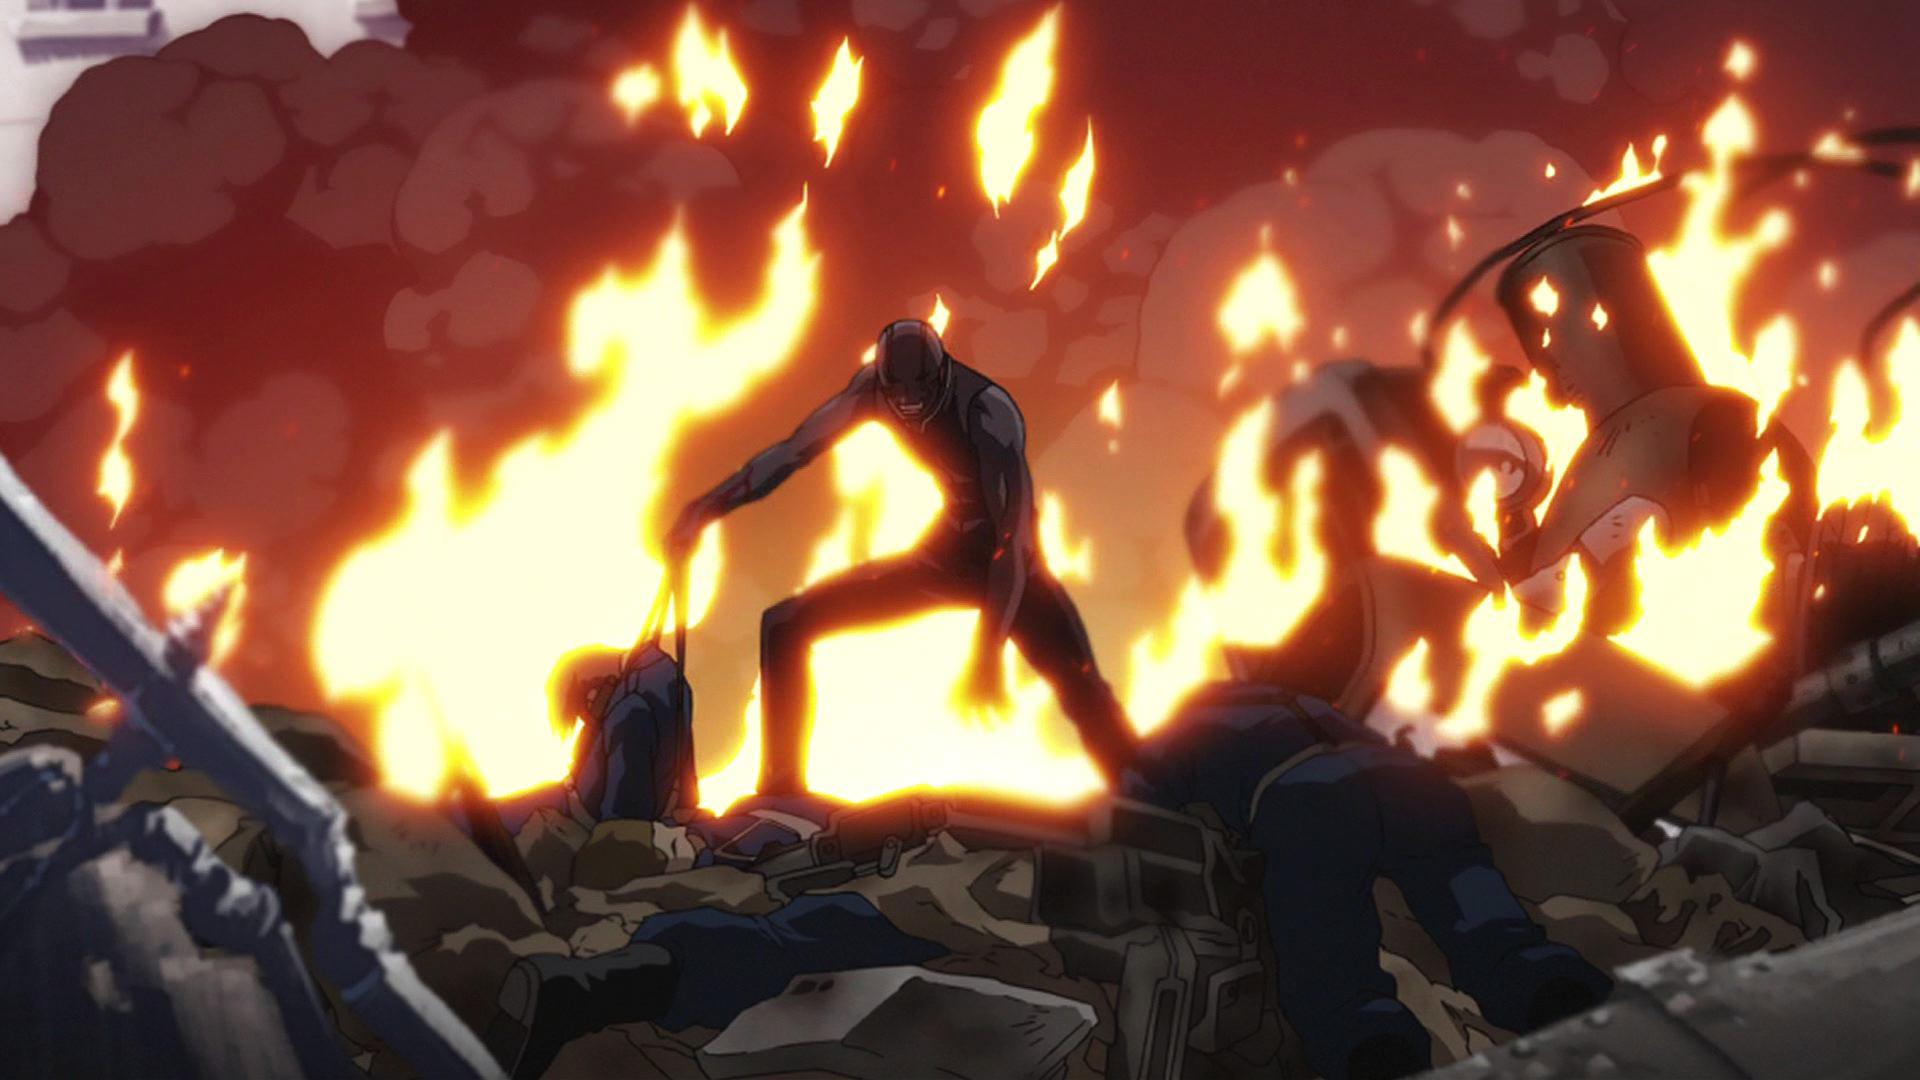 Watch Fullmetal Alchemist: Brotherhood Season 1 Episode 58 ...